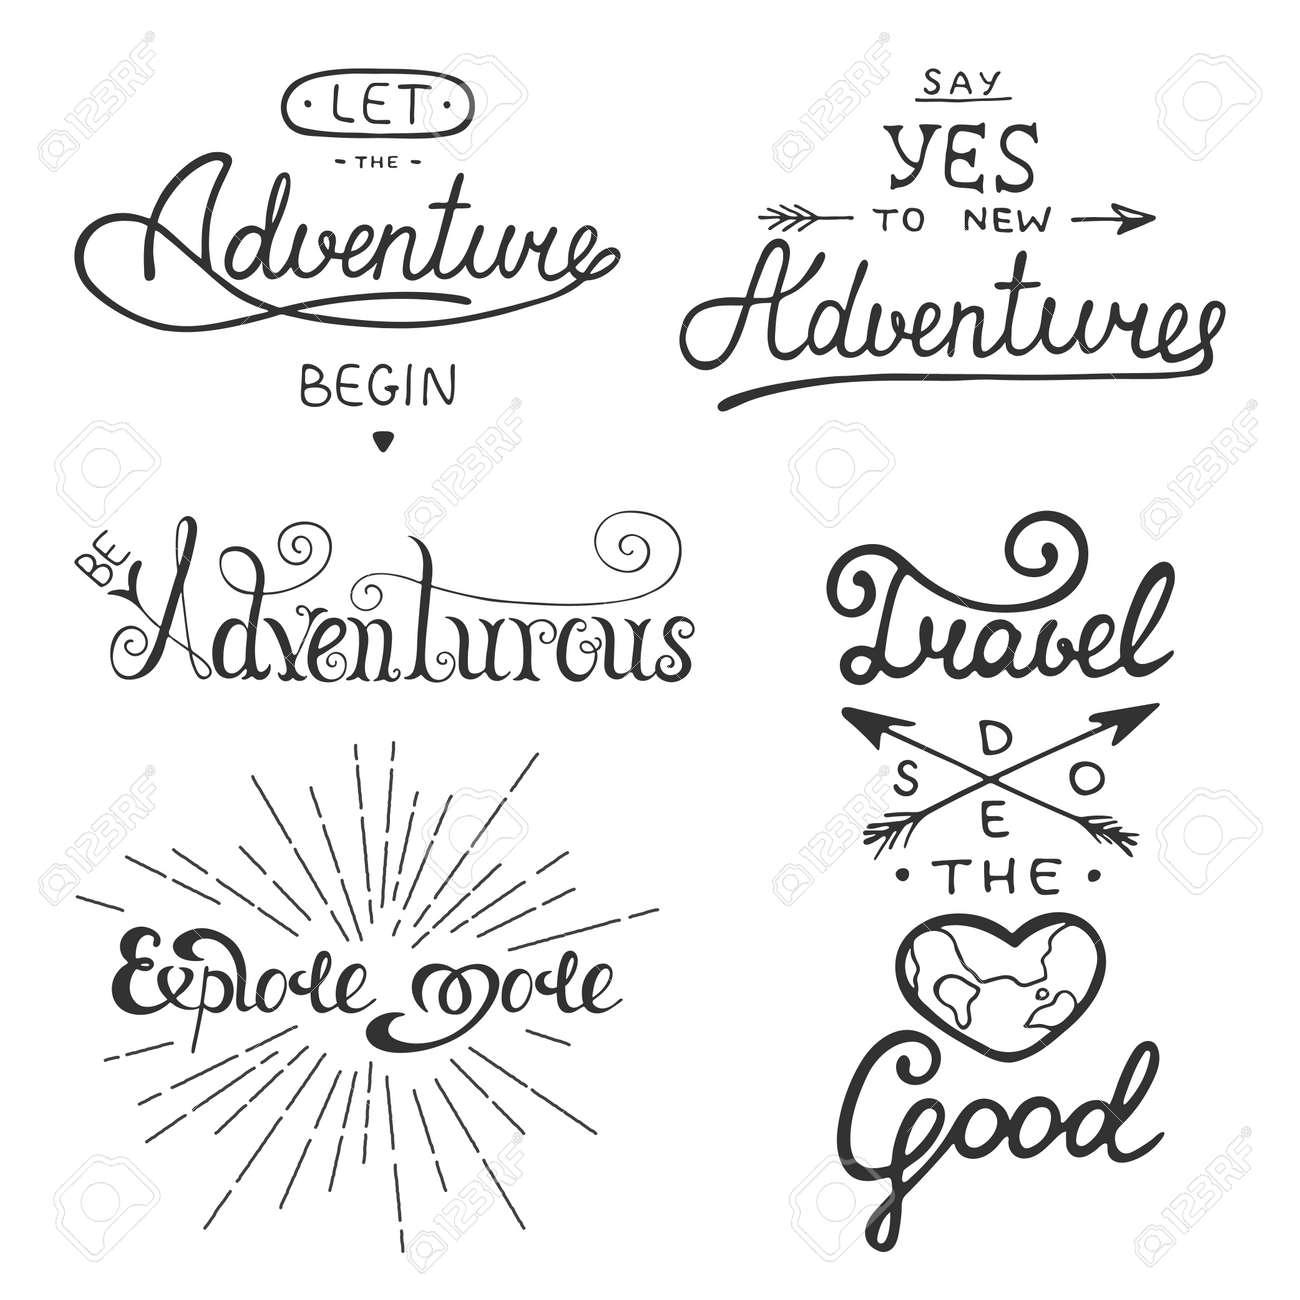 Letras En Latin Para Tatuajes - Letras-en-latin-para-tatuajes